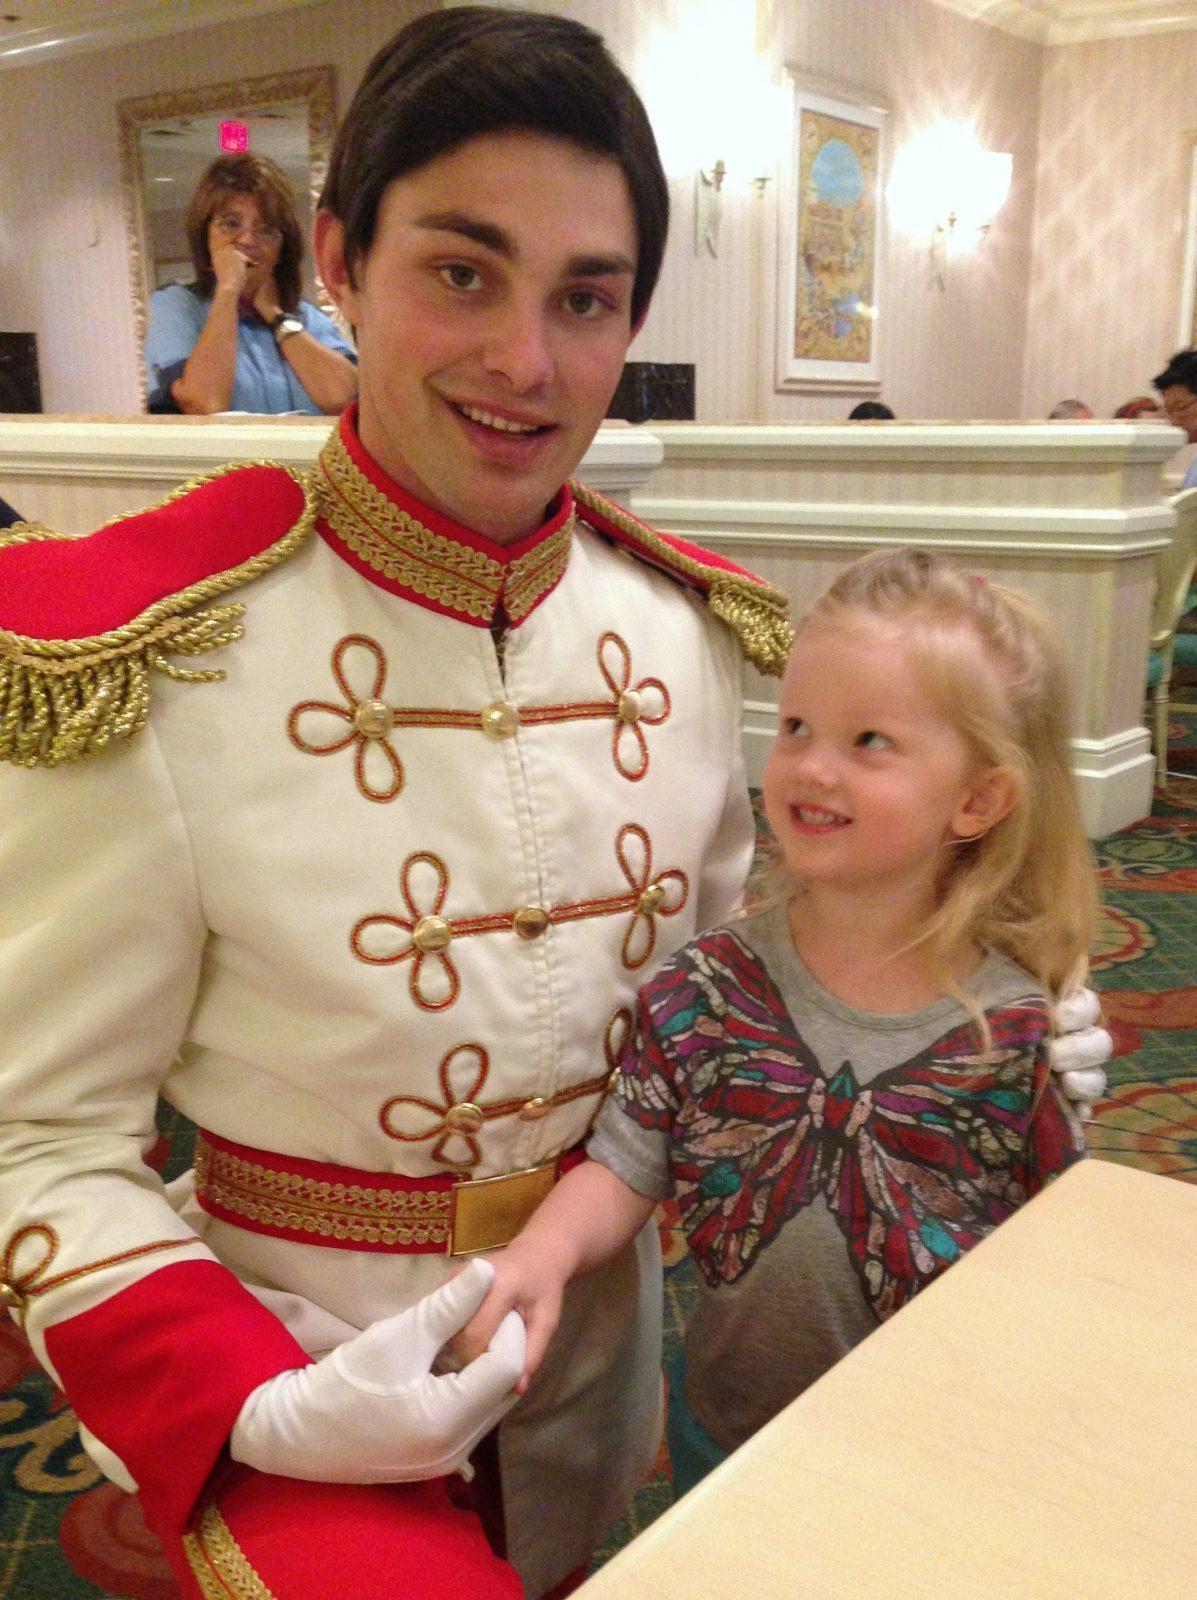 little girl meeting prince charming